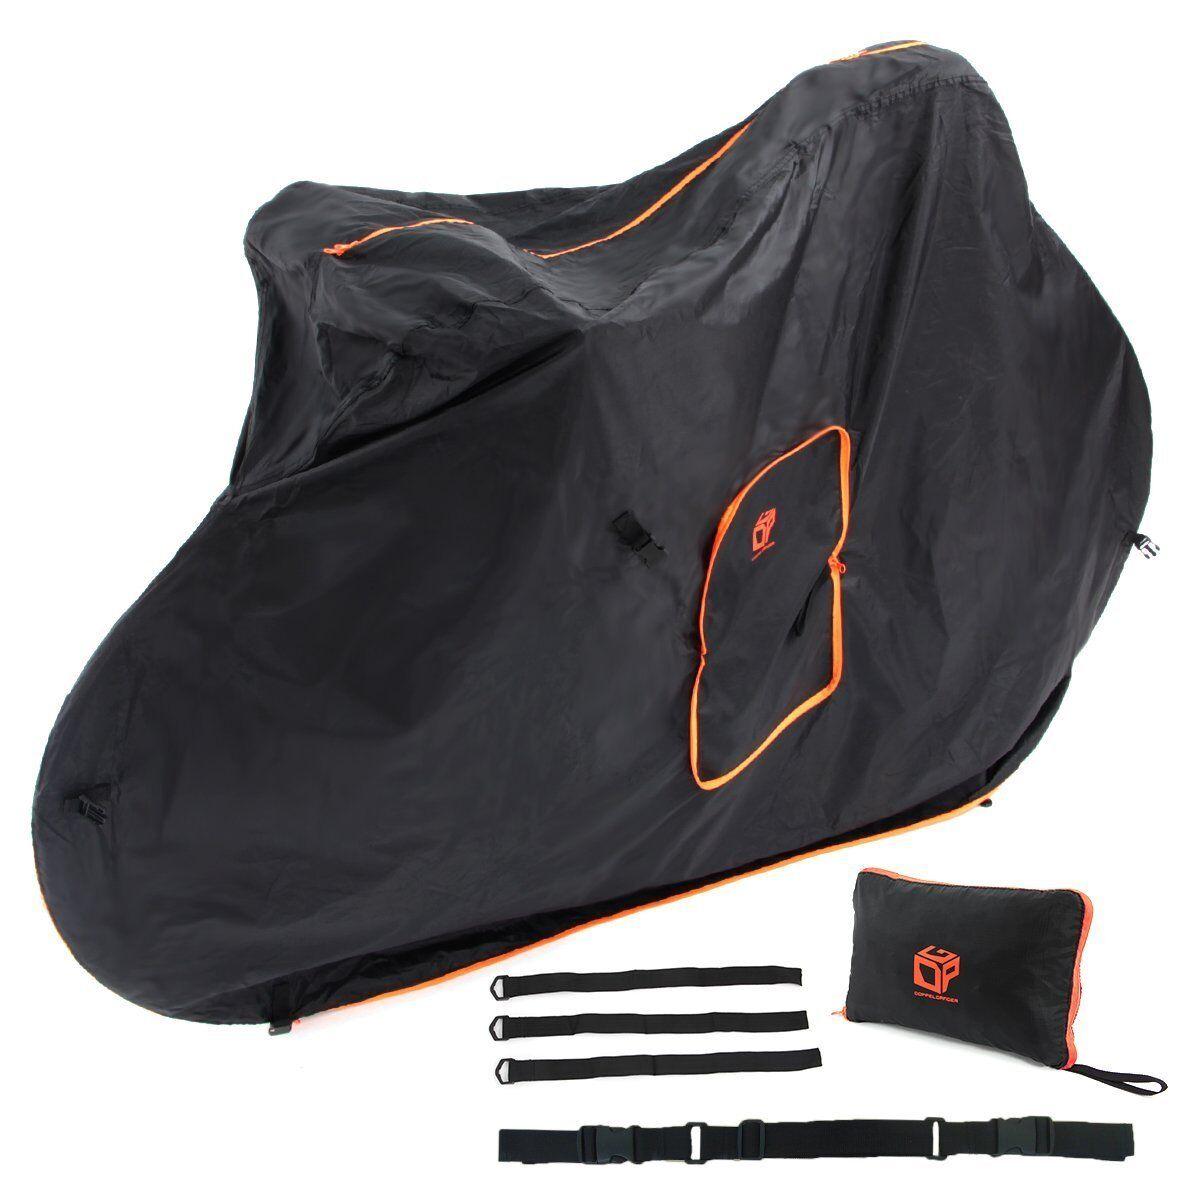 DOPPELGANGER DCB168-BK Bicycle Carry Bag Transport Case YBT